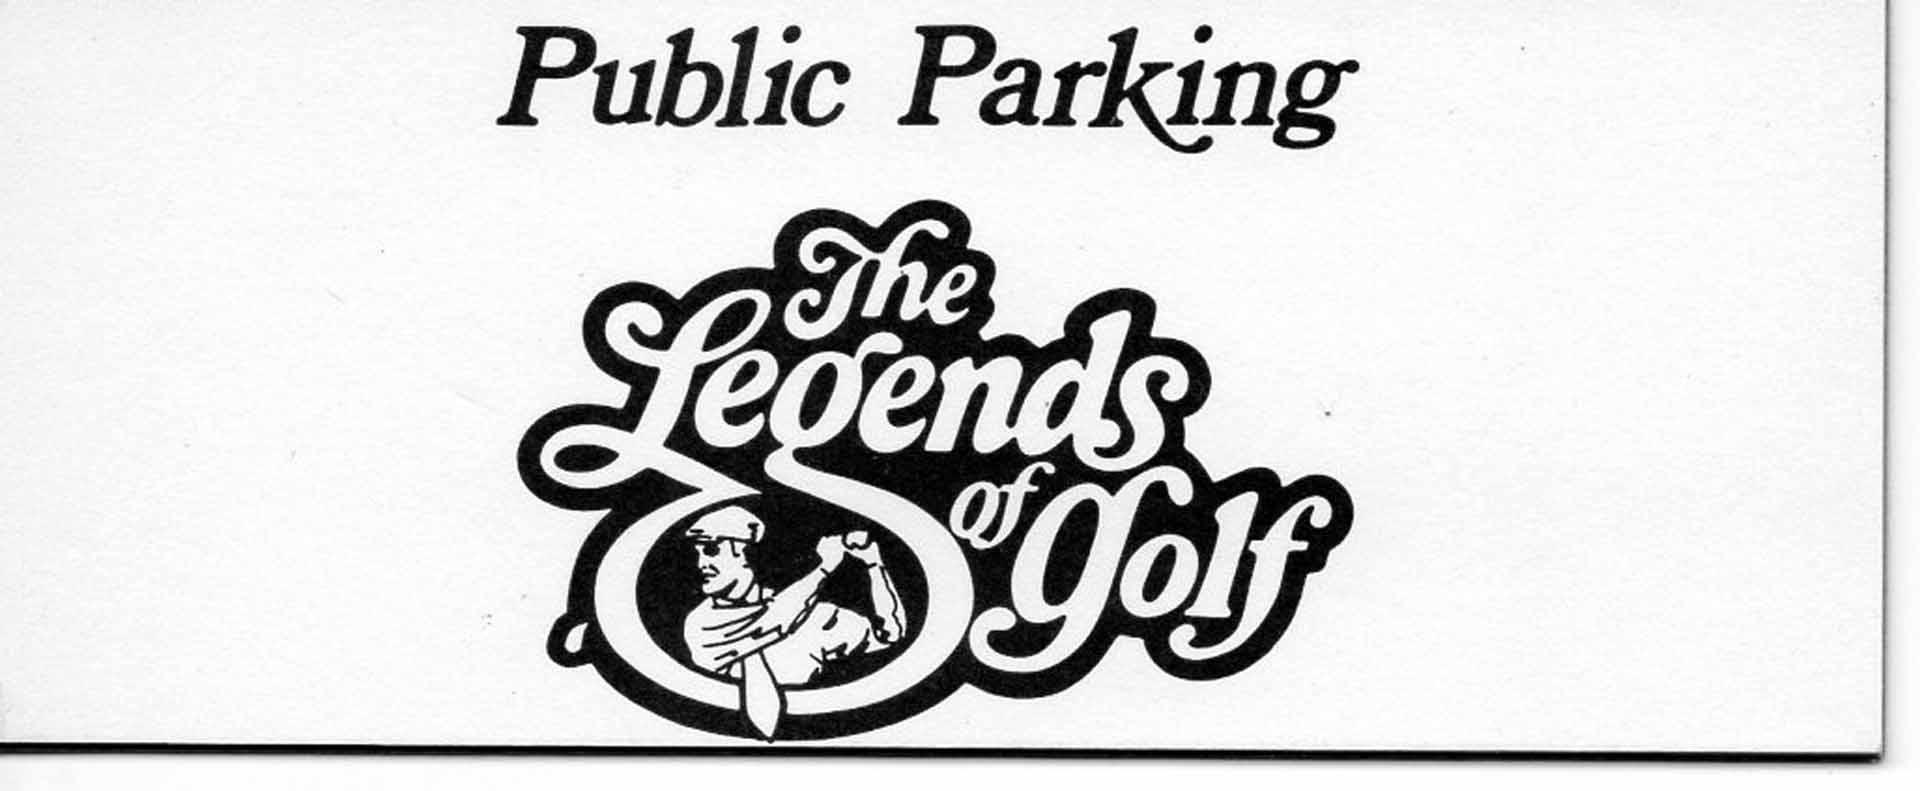 1978 Legends of golf onion creek 04/26-30